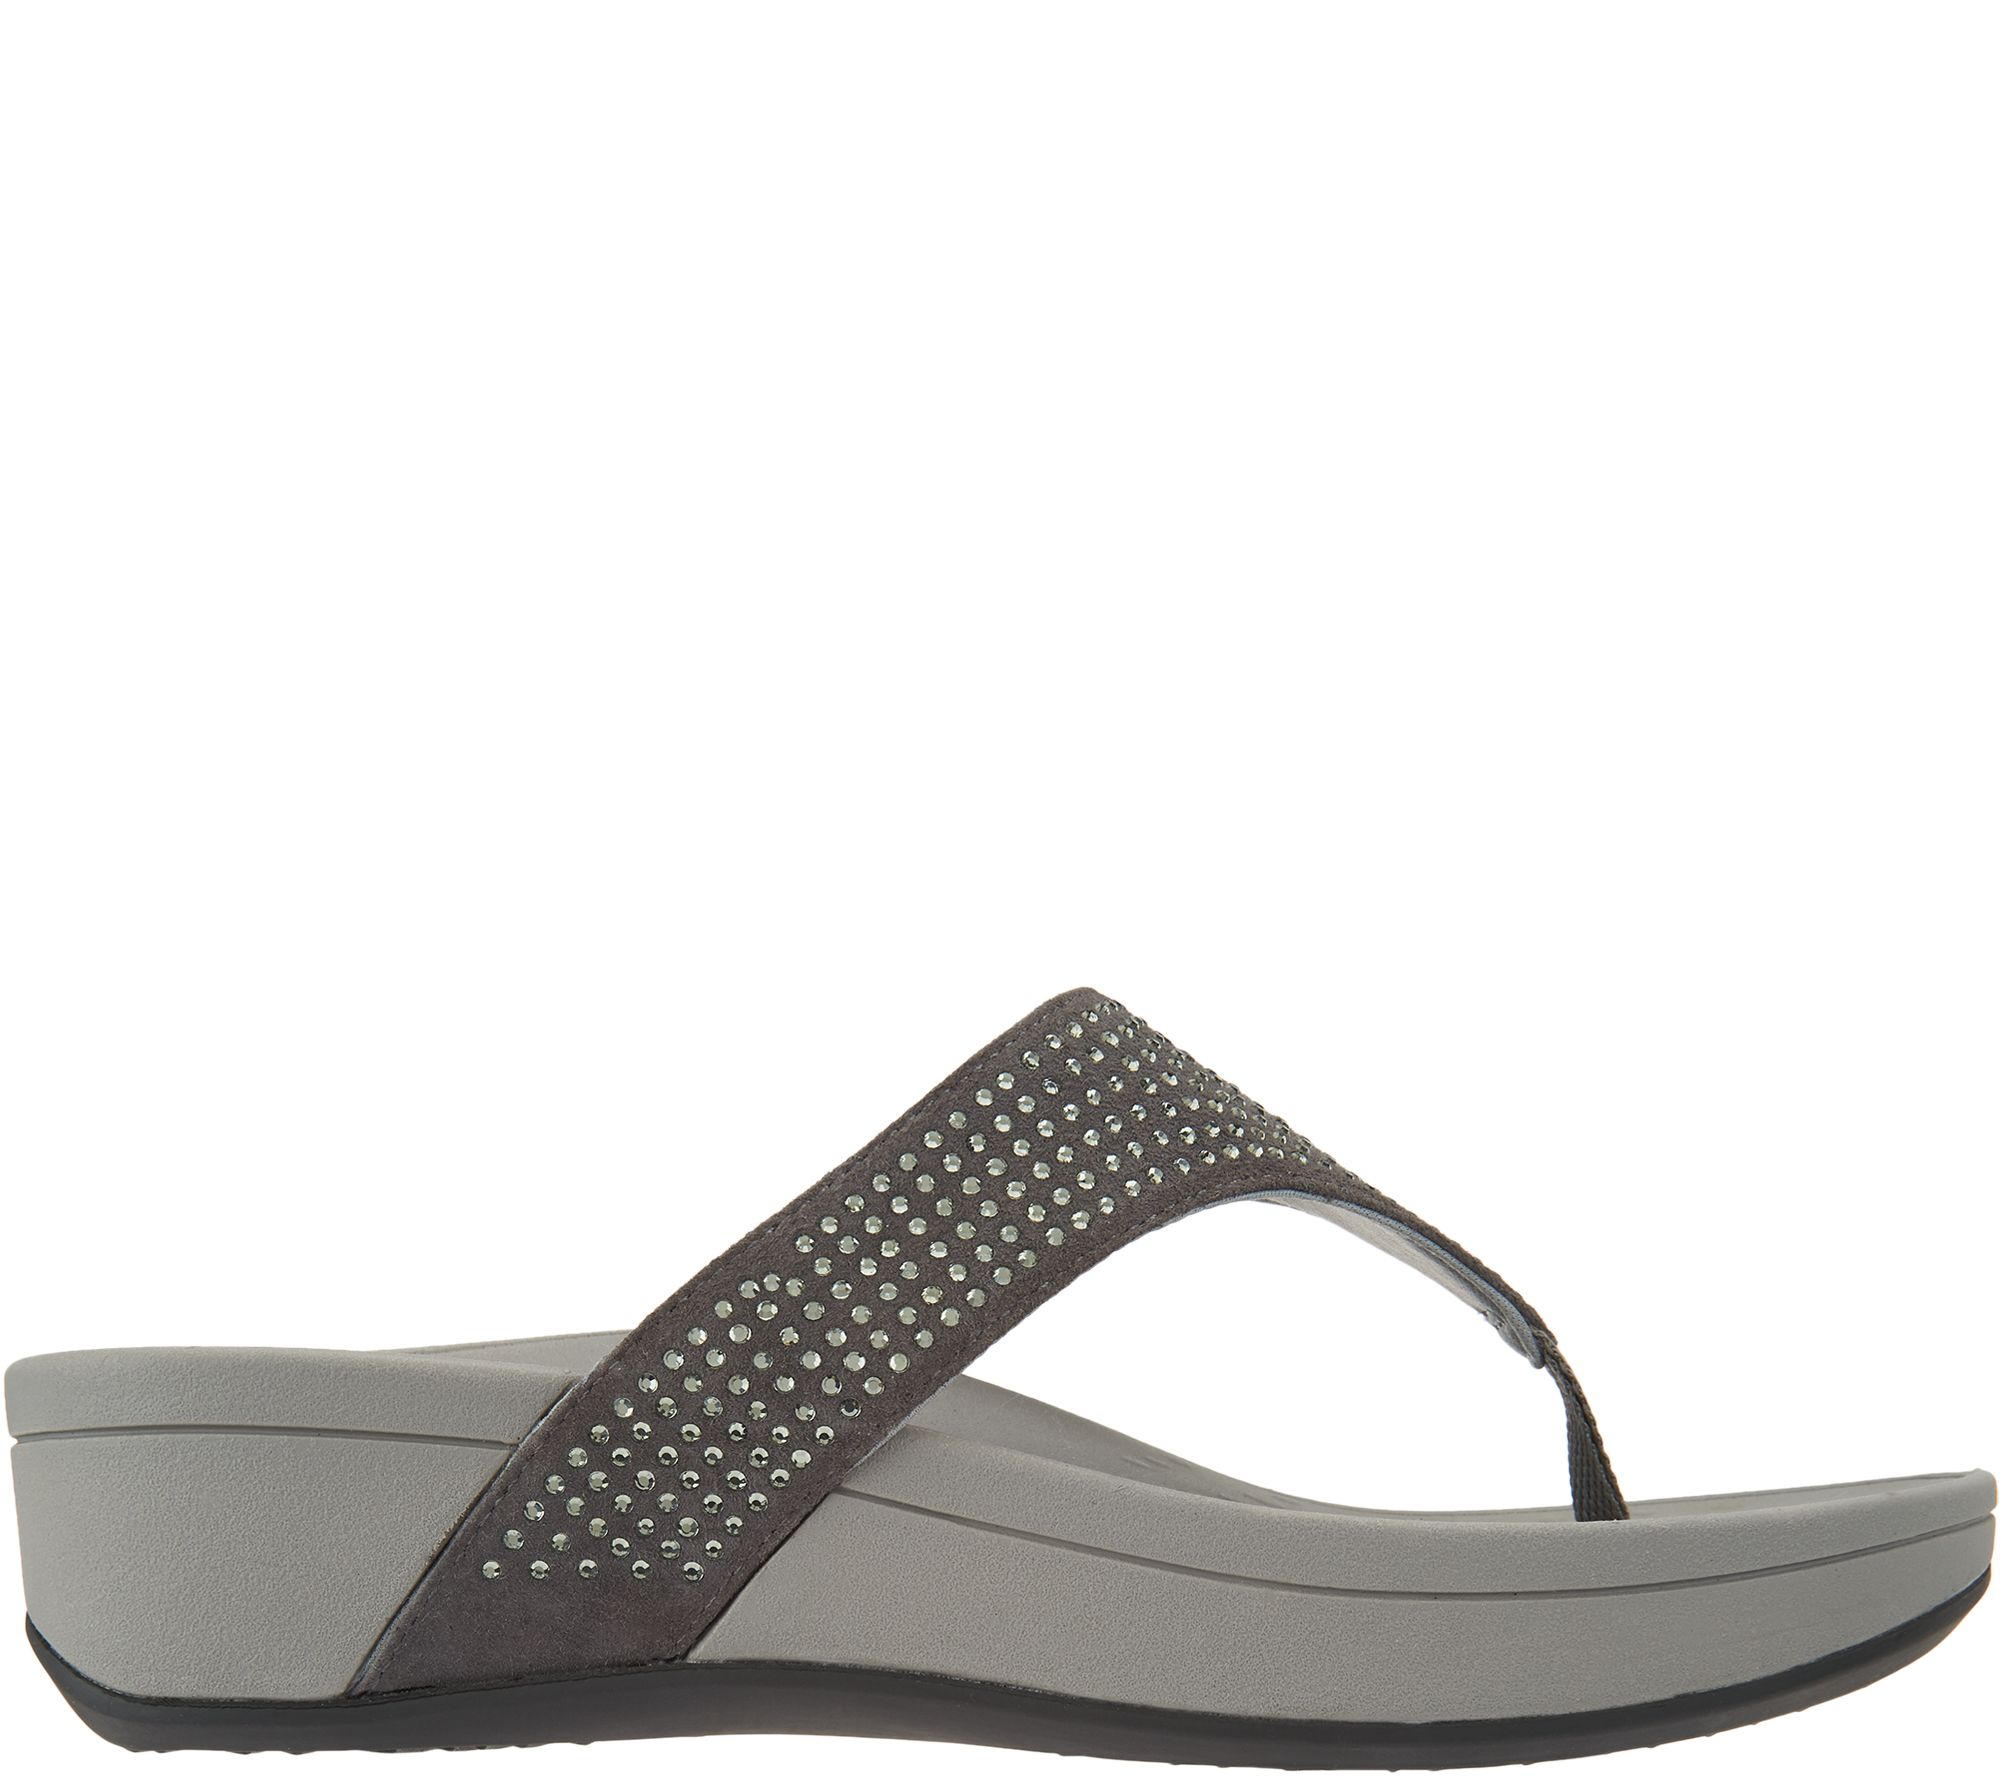 81f6e8183991 Vionic Suede Platform Sandals w  Rhinestones - Naples - Page 1 — QVC.com